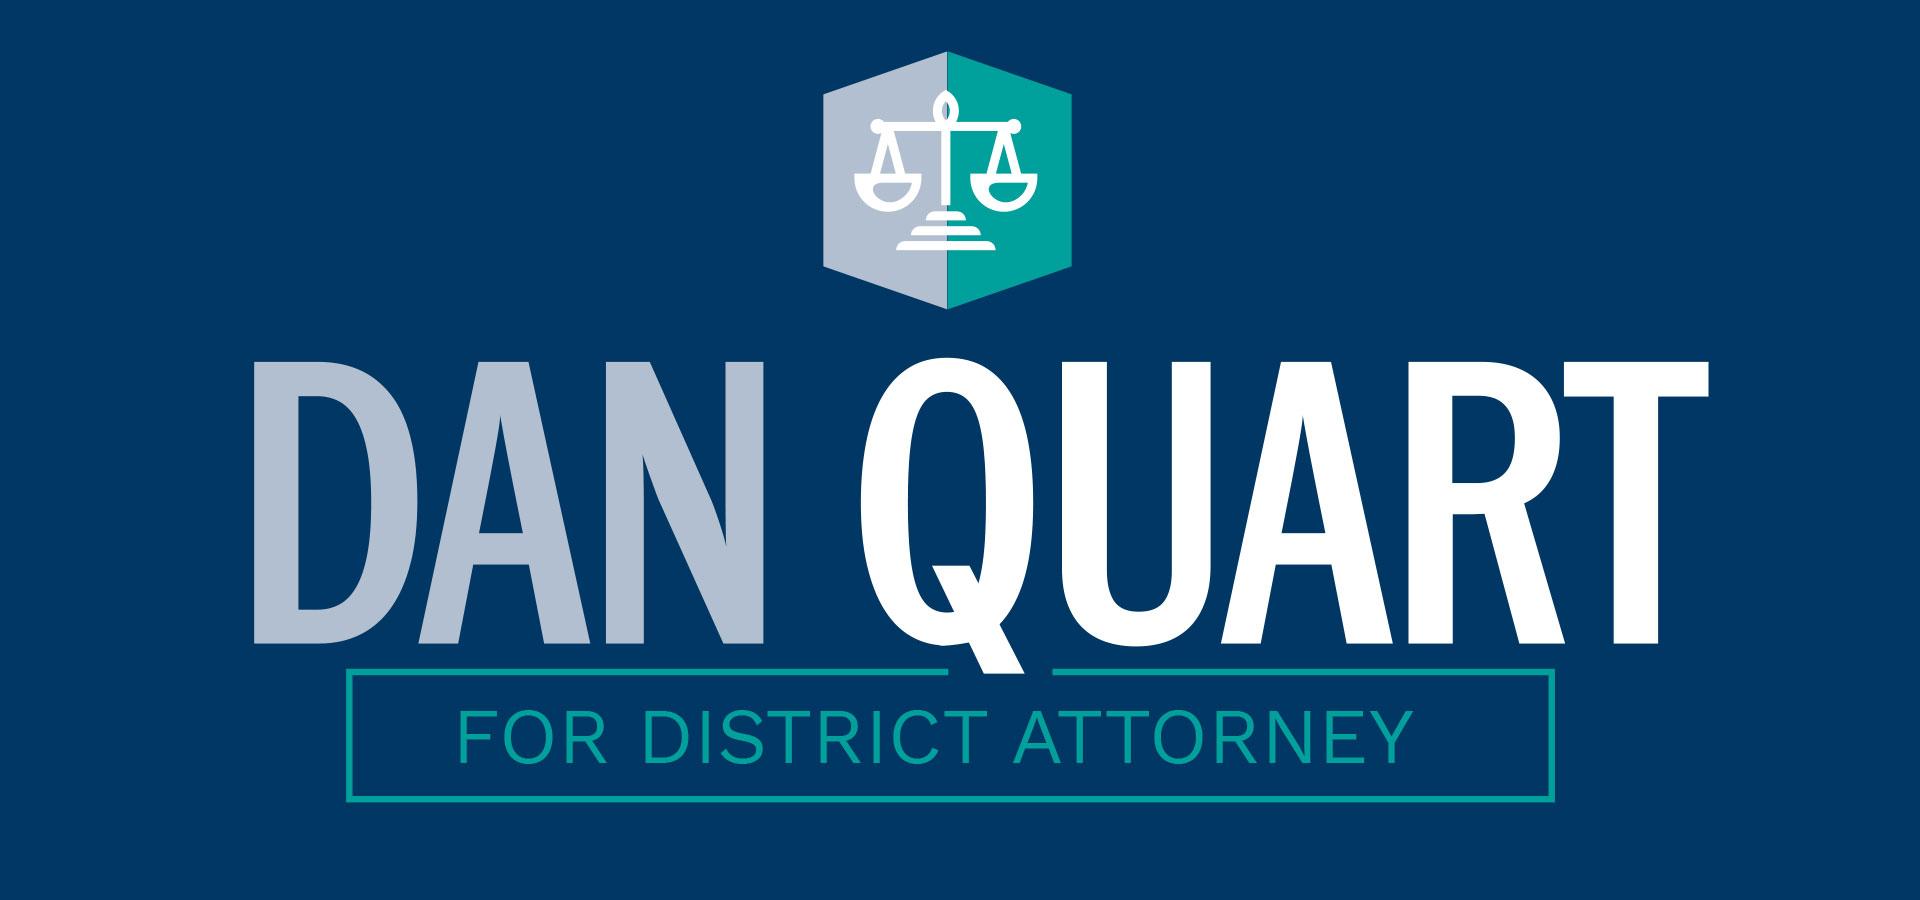 Dan Quart for Manhattan District Attorney logo